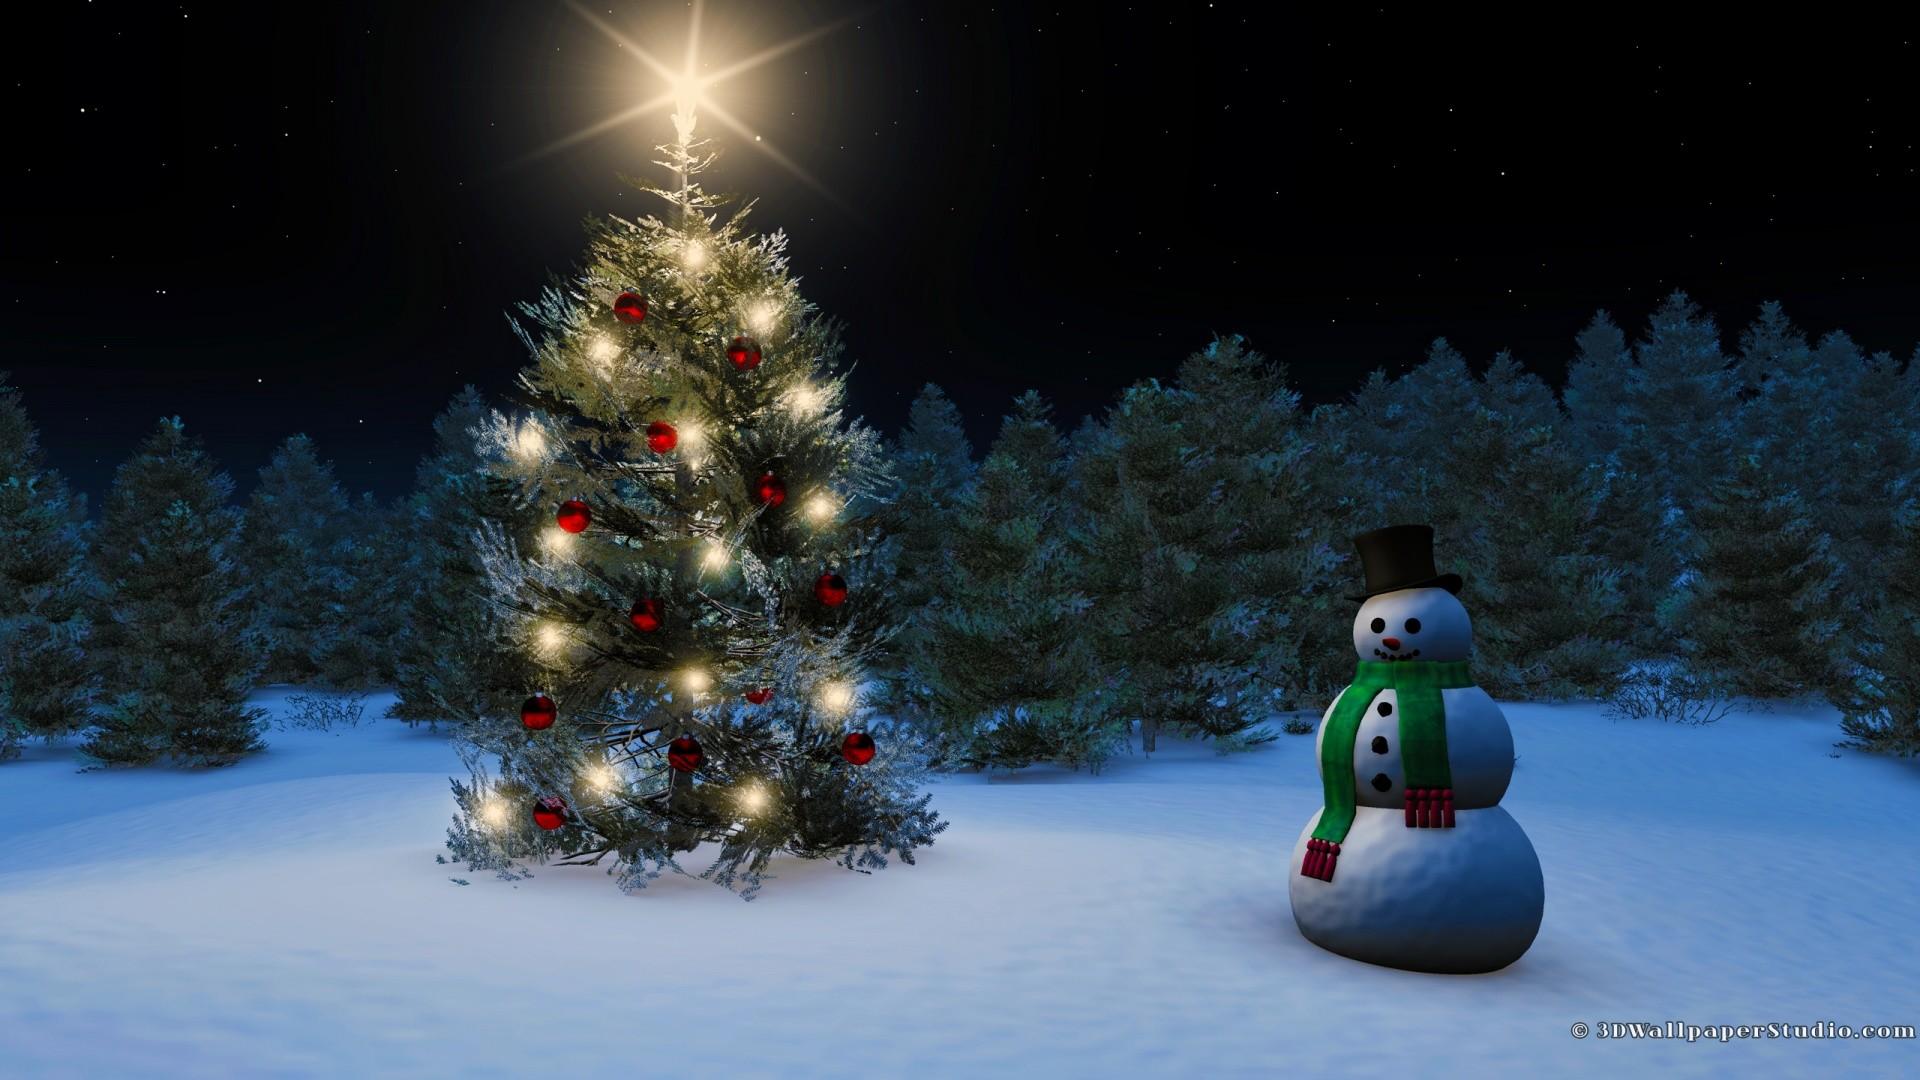 Christmas Wallpaper wallpaper – 599151